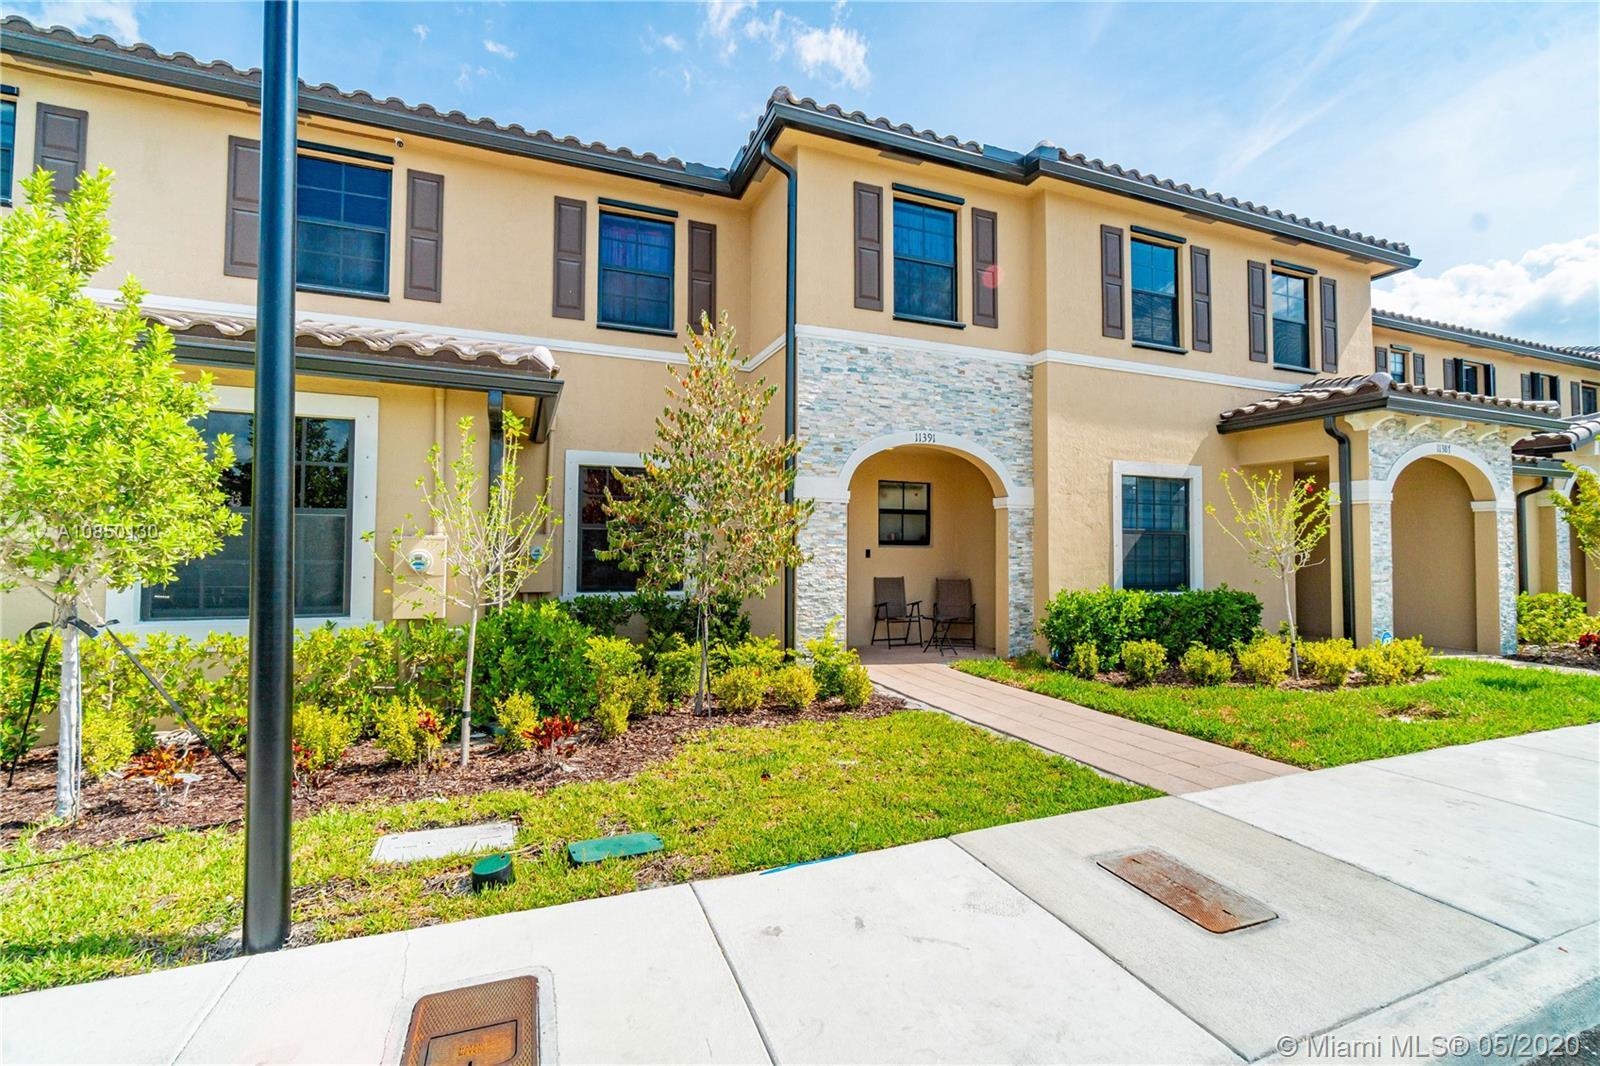 11391 SW 248th Ter, Homestead, FL 33032 - Homestead, FL real estate listing